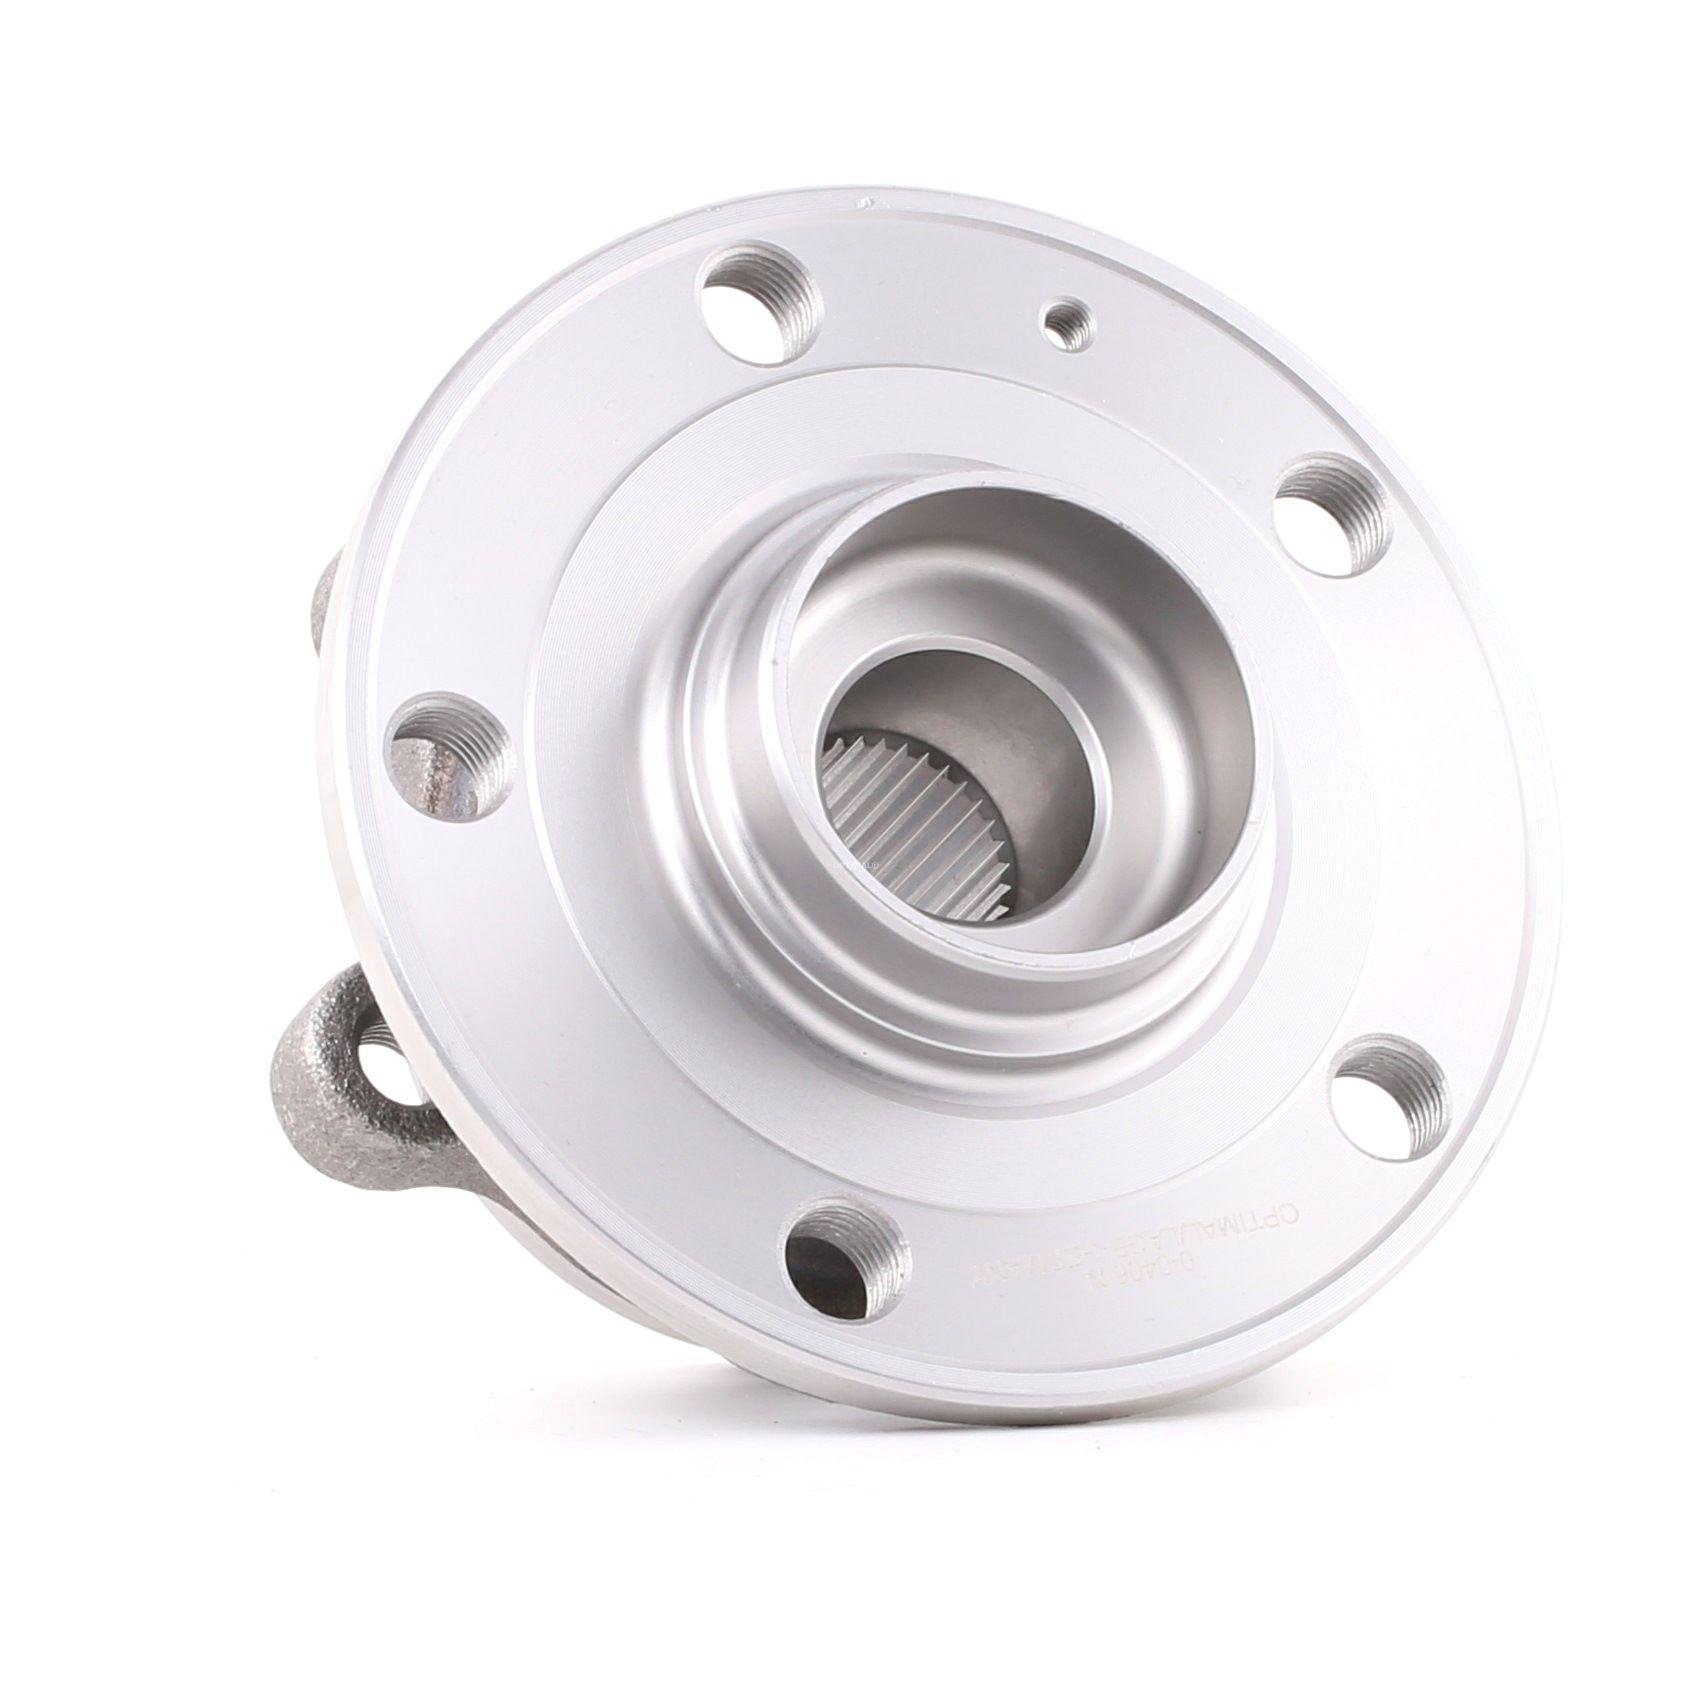 VW TIGUAN 2014 Radnabe - Original OPTIMAL 101017 Ø: 136,5mm, Innendurchmesser: 29mm